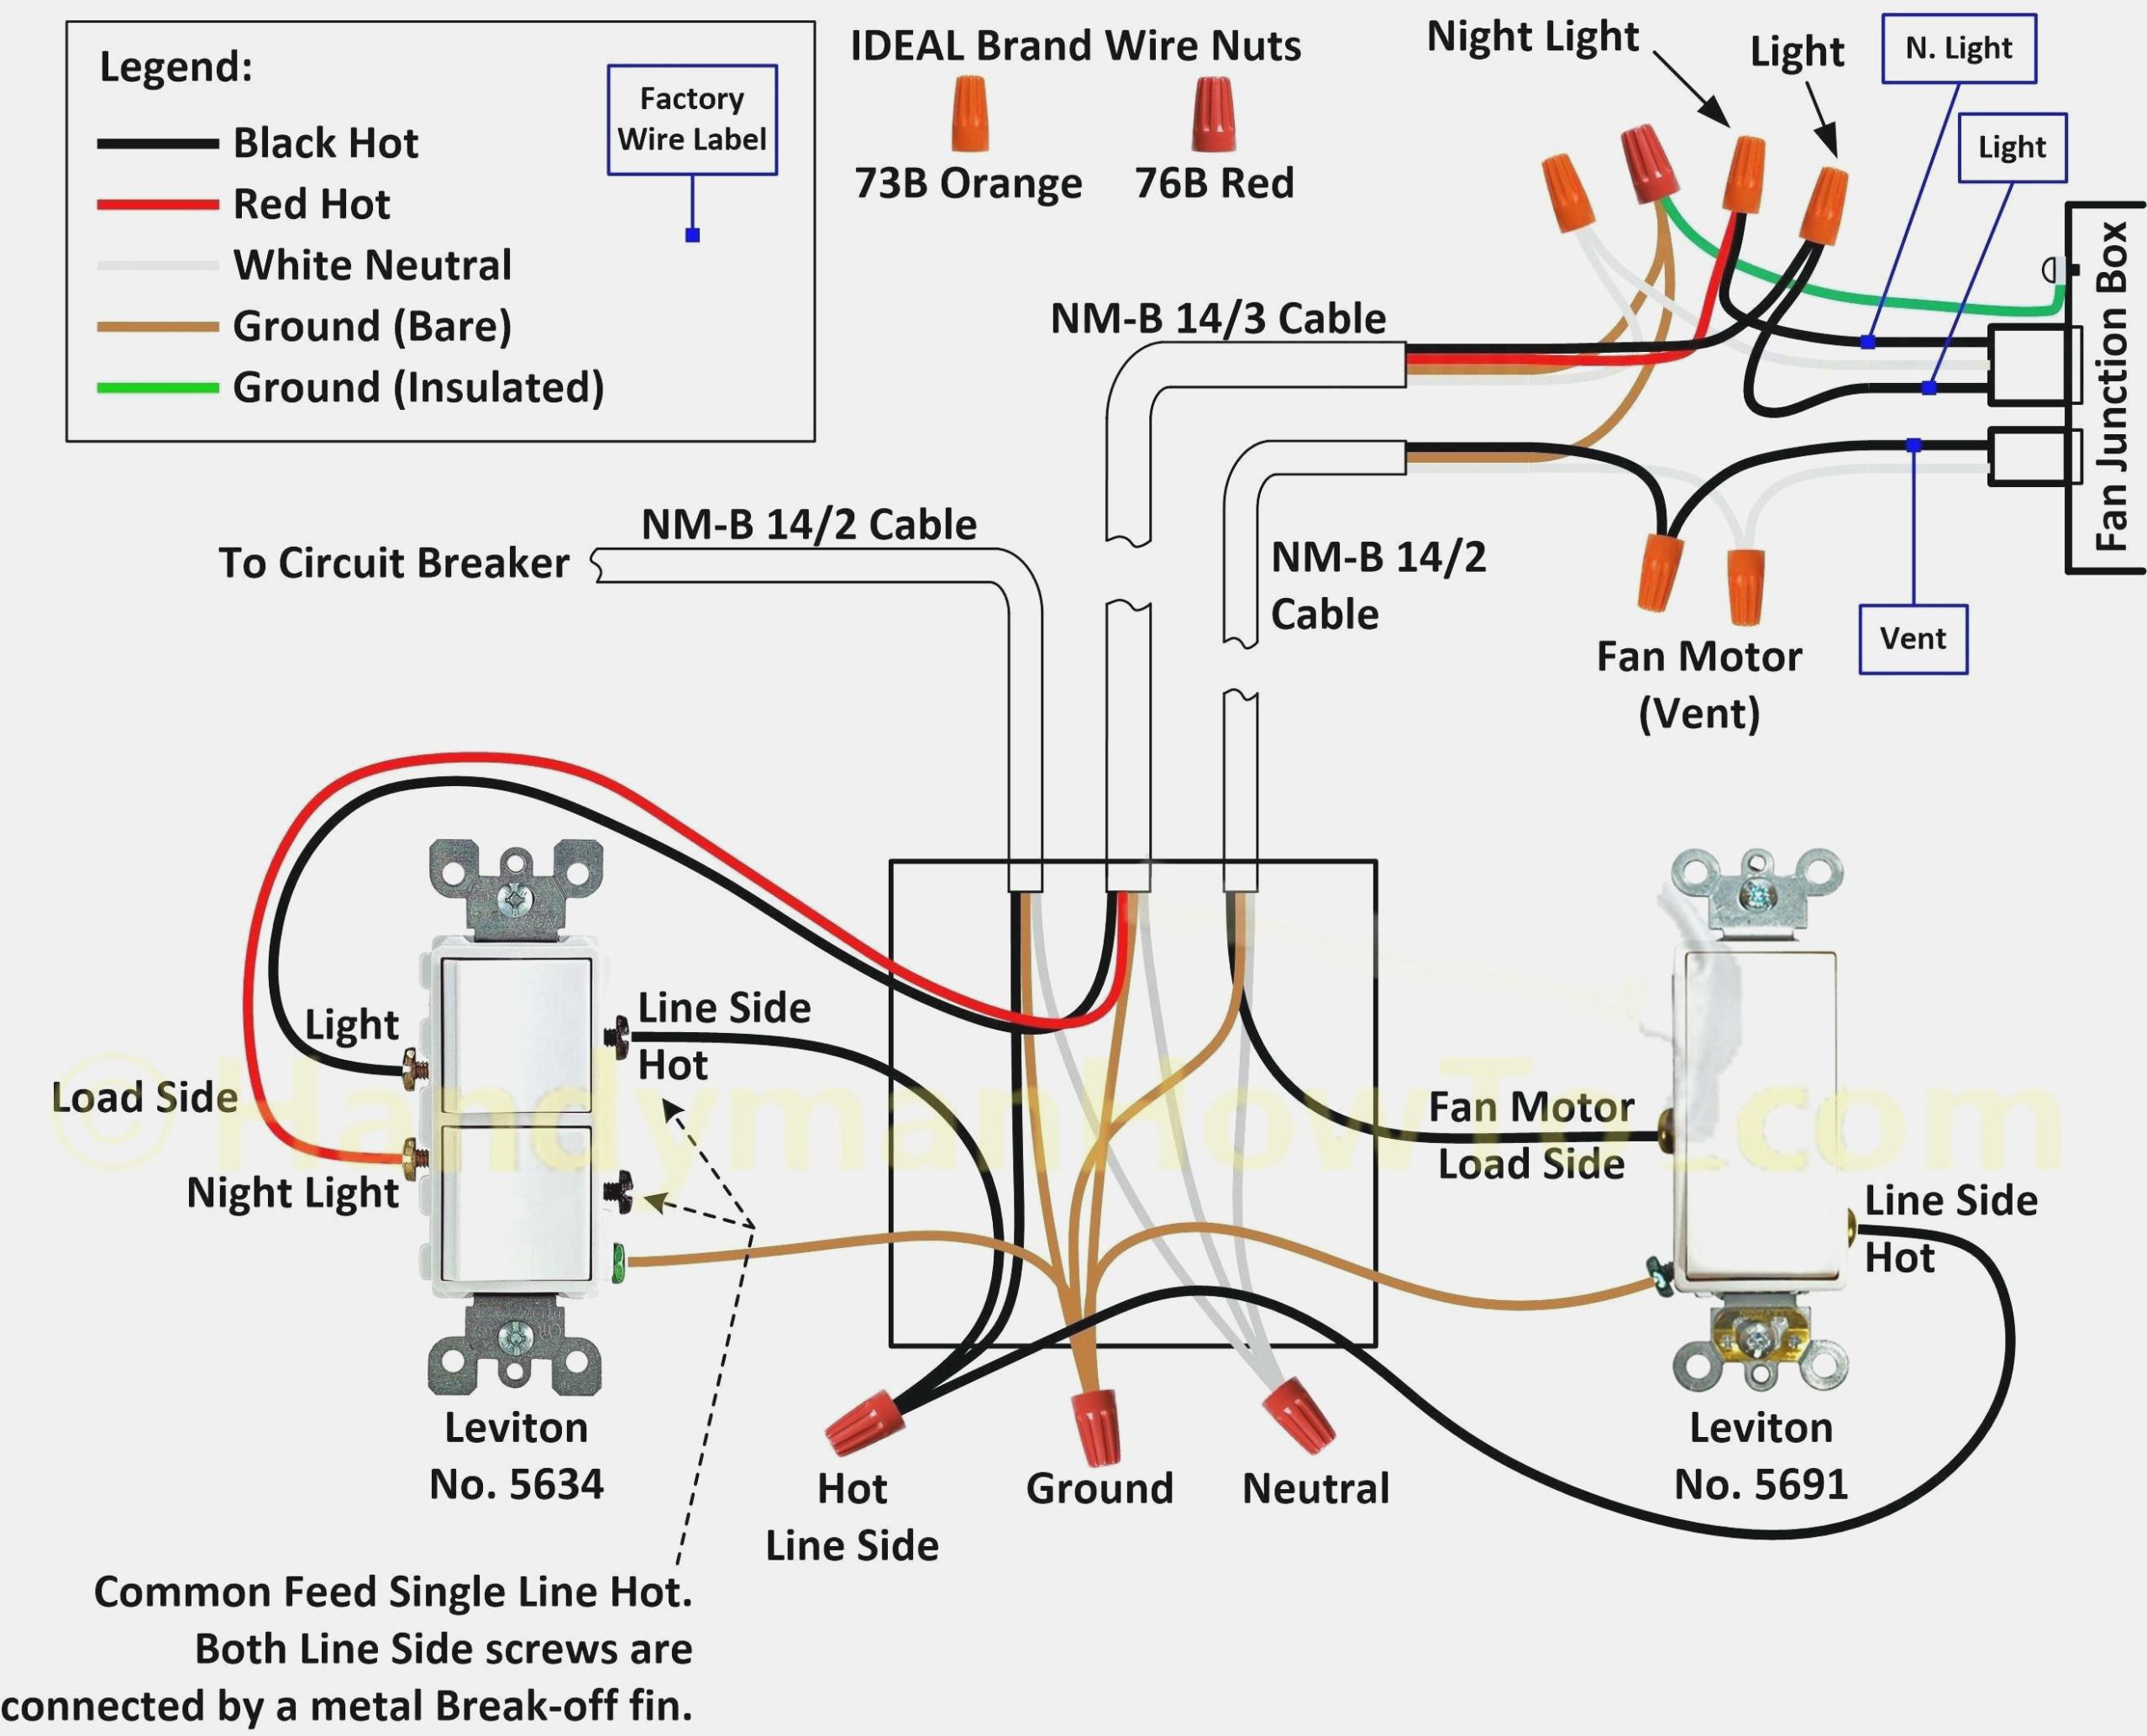 0 10 Volt Dimming Wiring Diagram | Wiring Diagram - 0 10 Volt Dimming Wiring Diagram